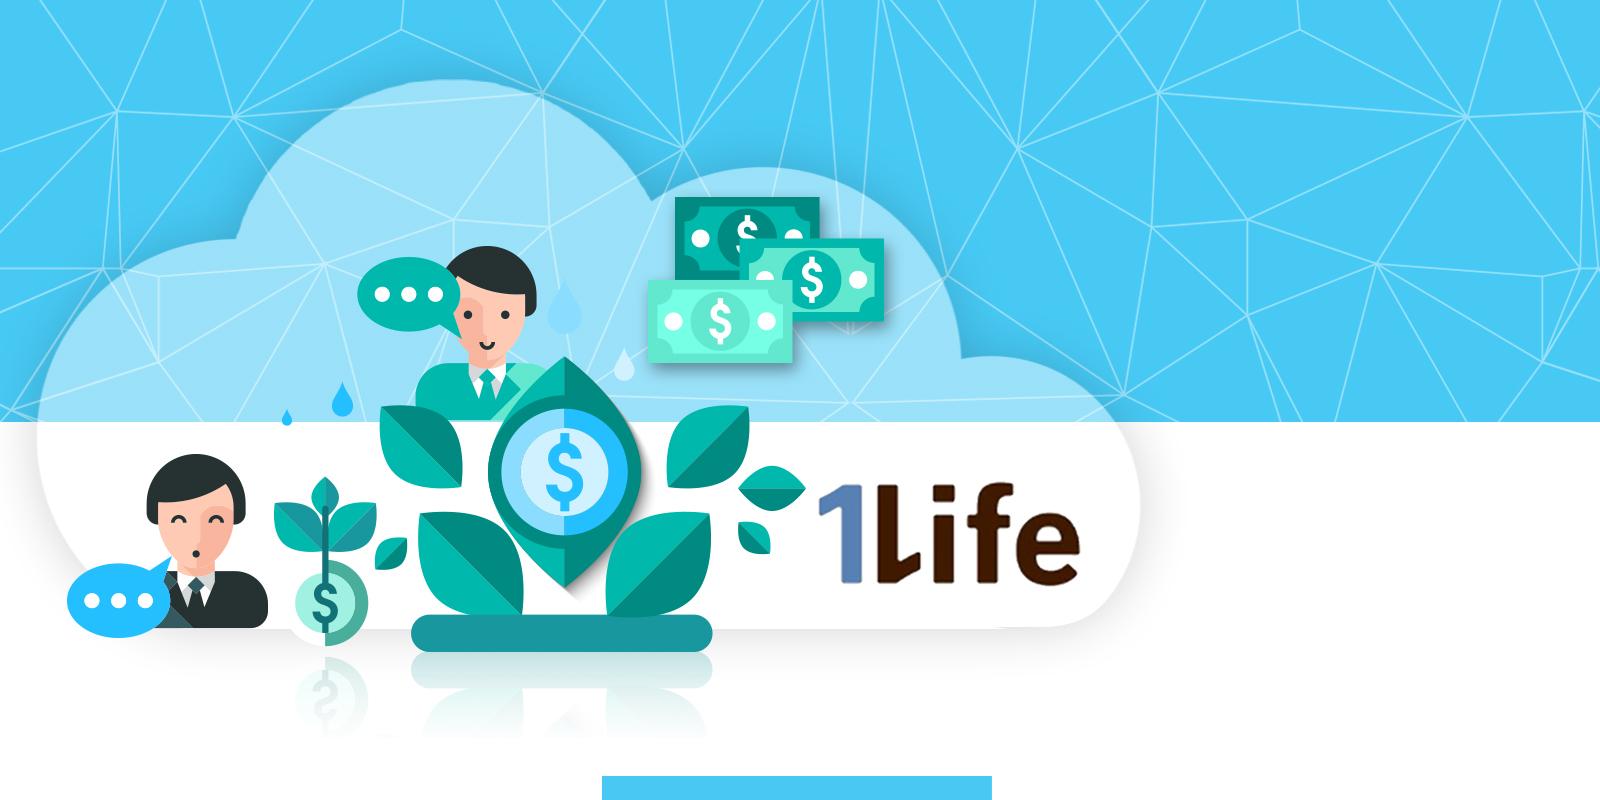 1Life Funeral Insurance Cover Facebook Bionic Optimisaiton